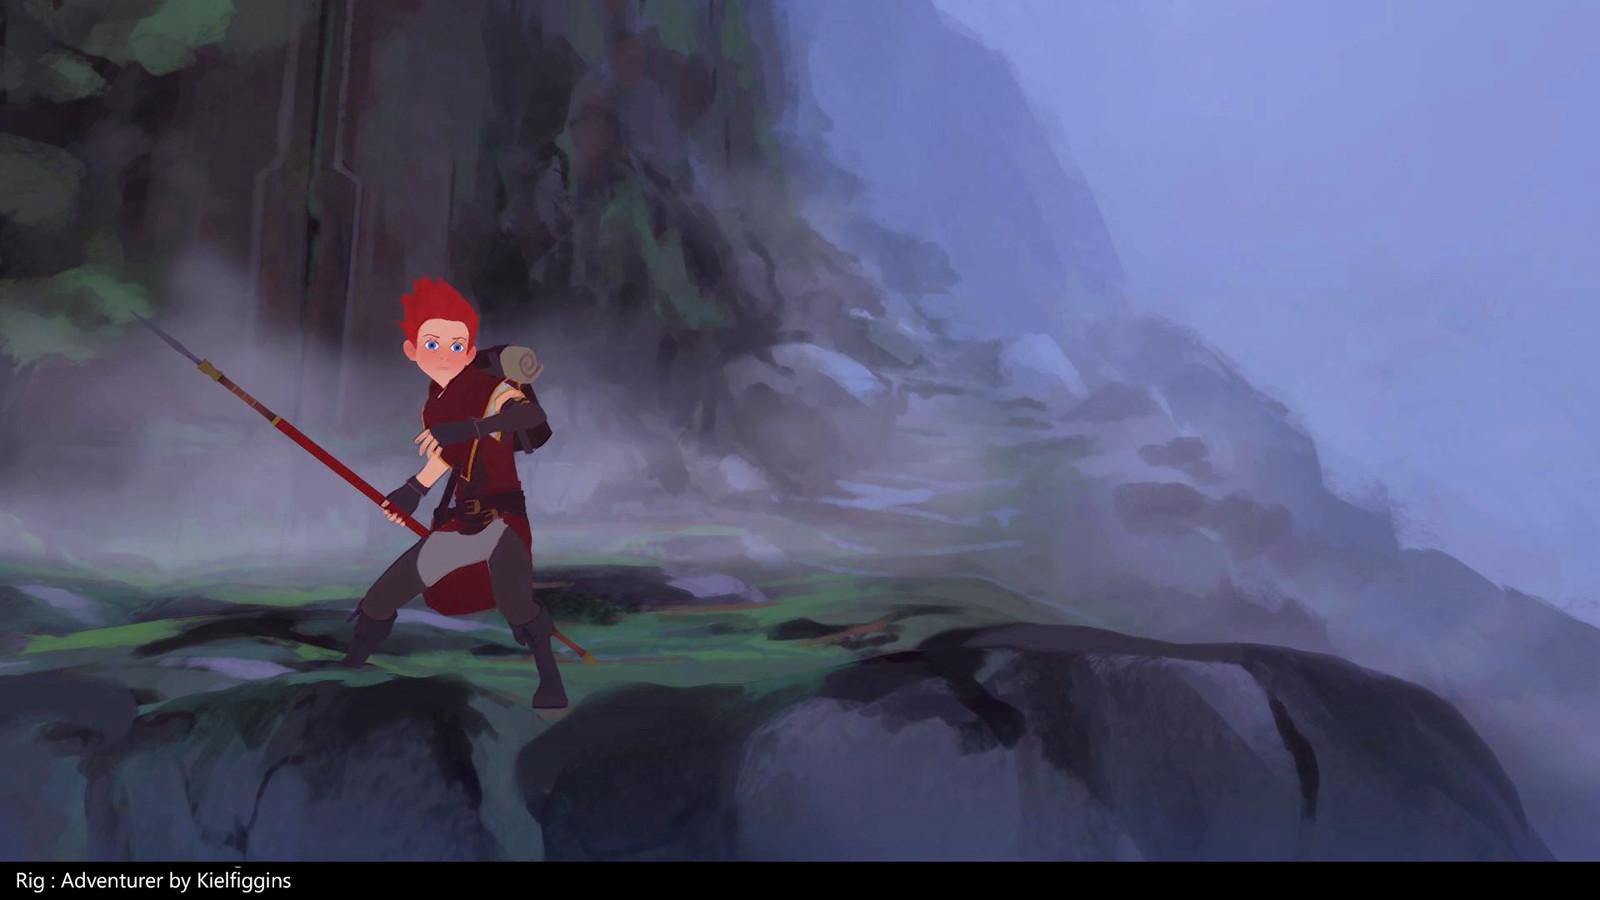 Animation - Airbender